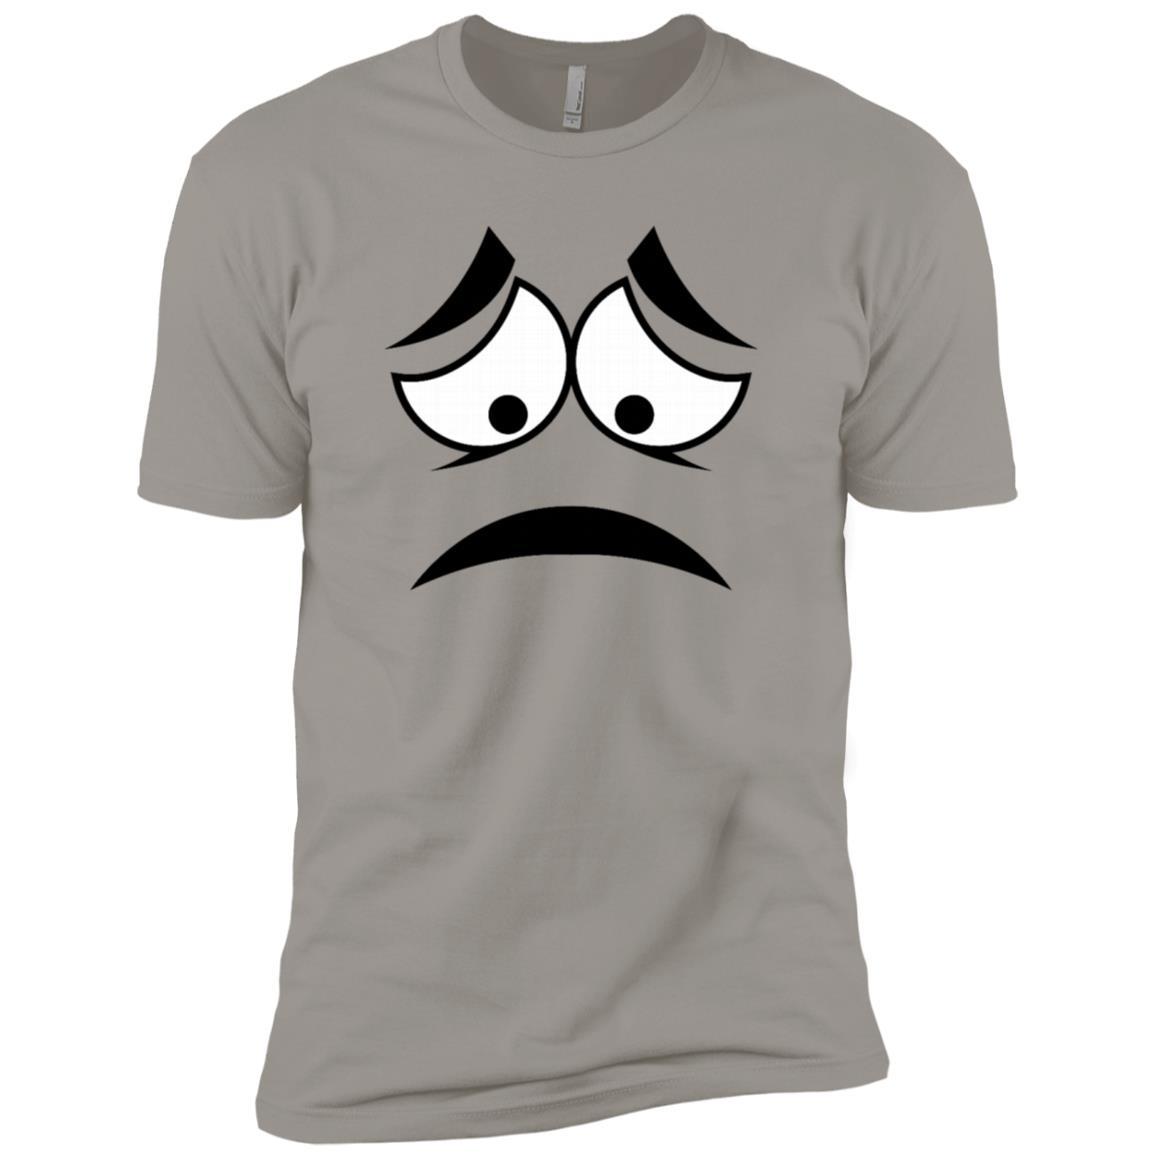 Sad Face Funny Men Short Sleeve T-Shirt